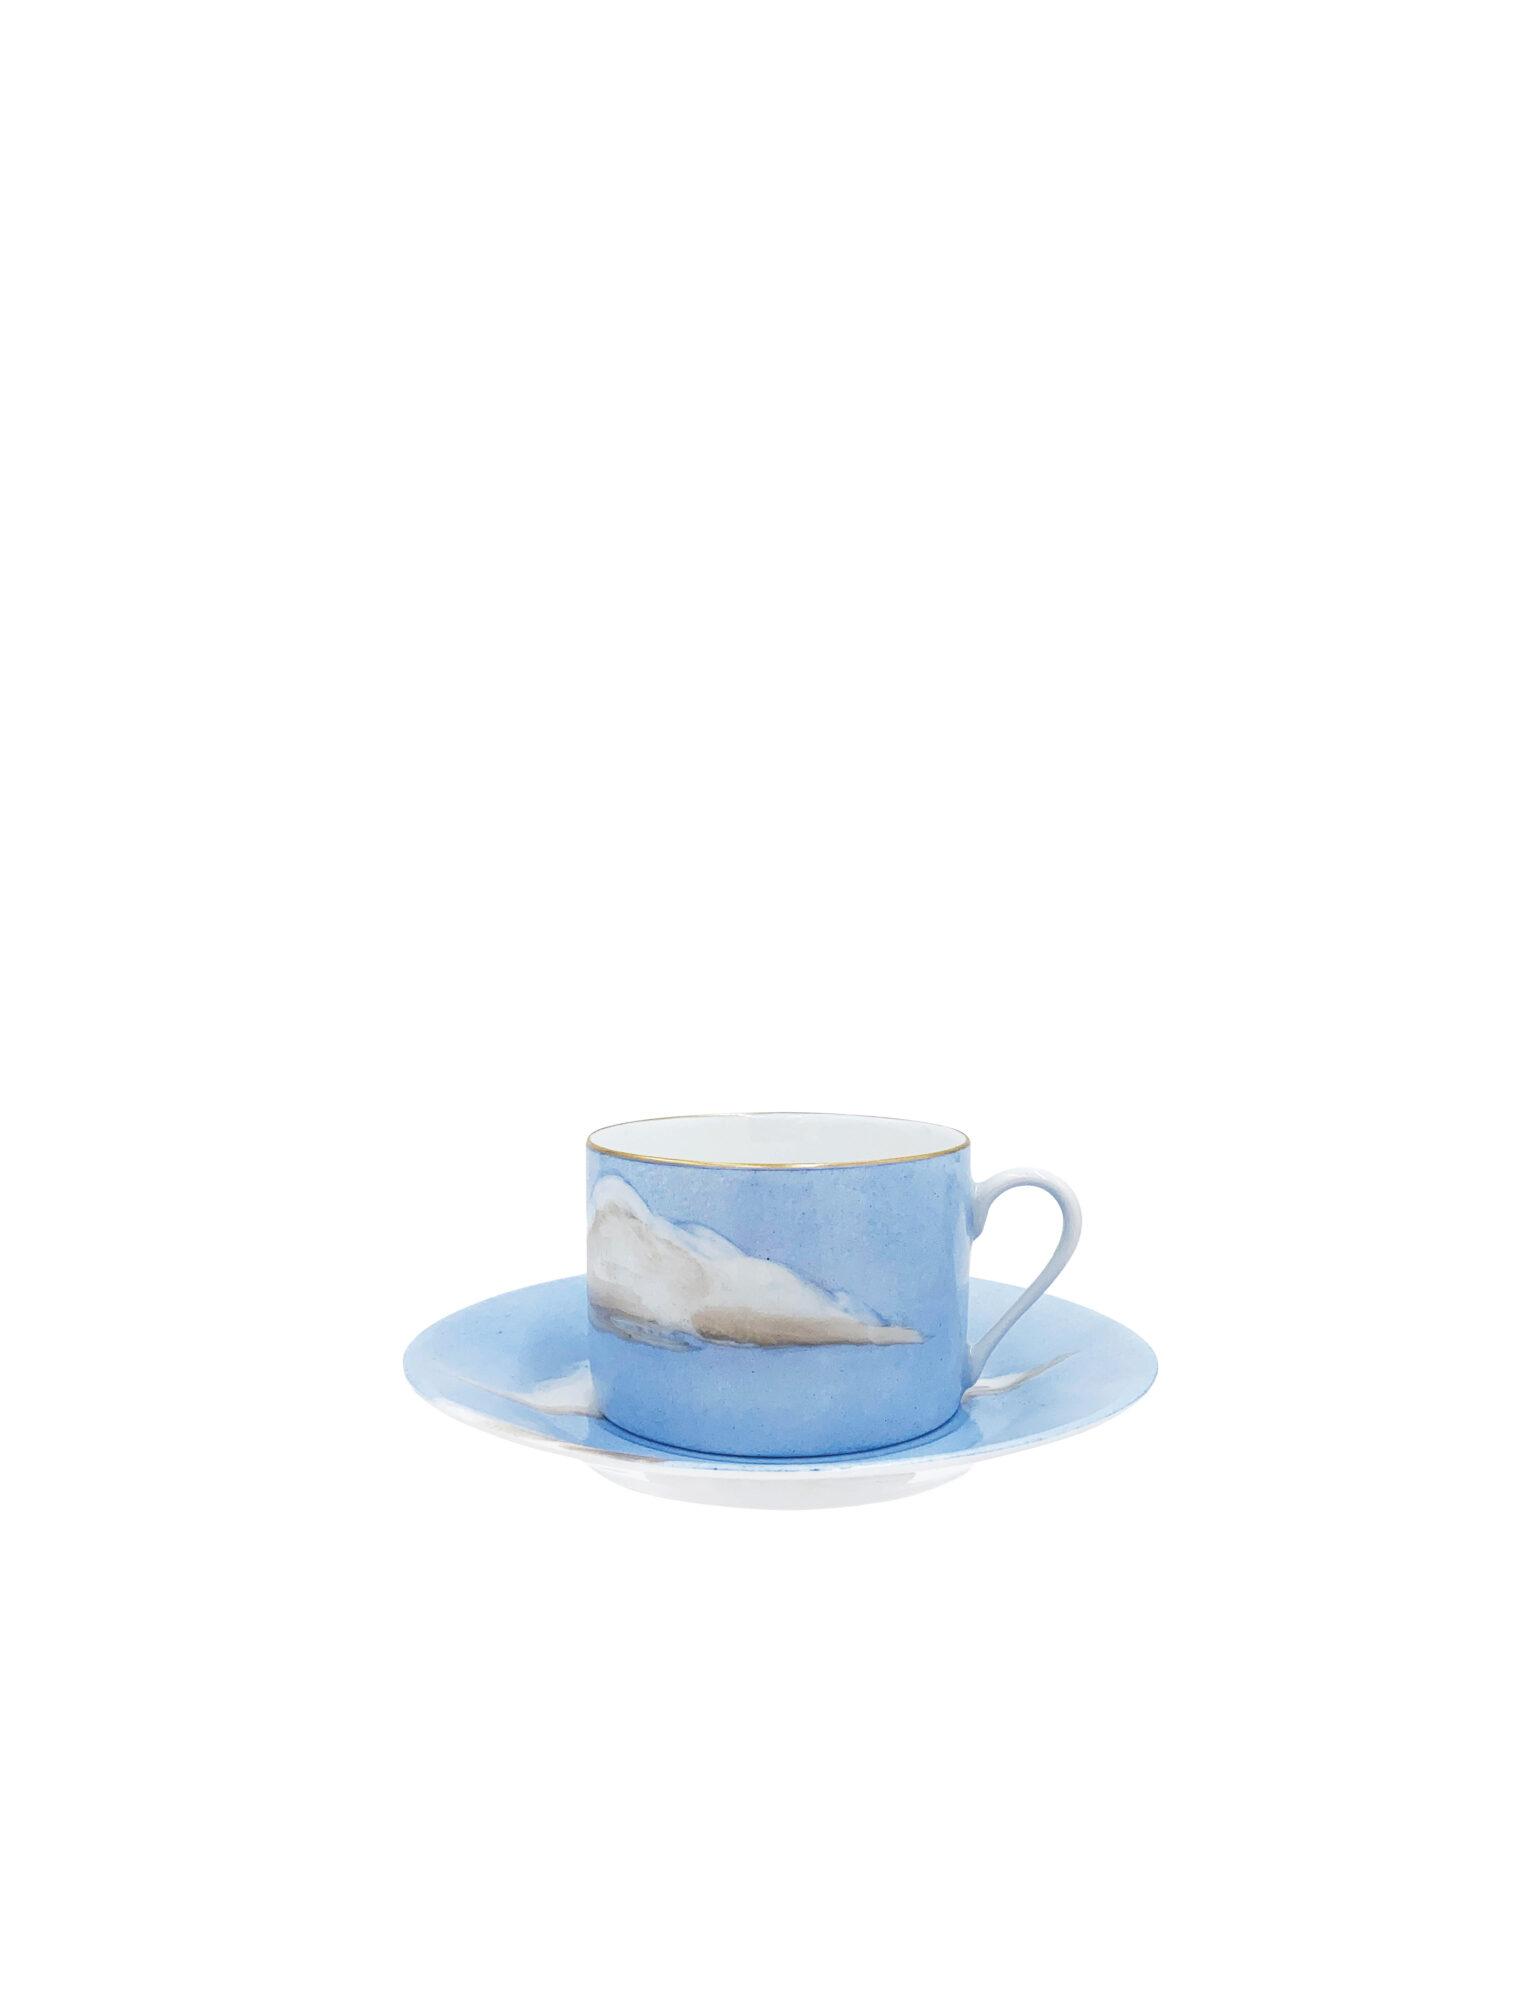 blue sky and cloud mug and saucer